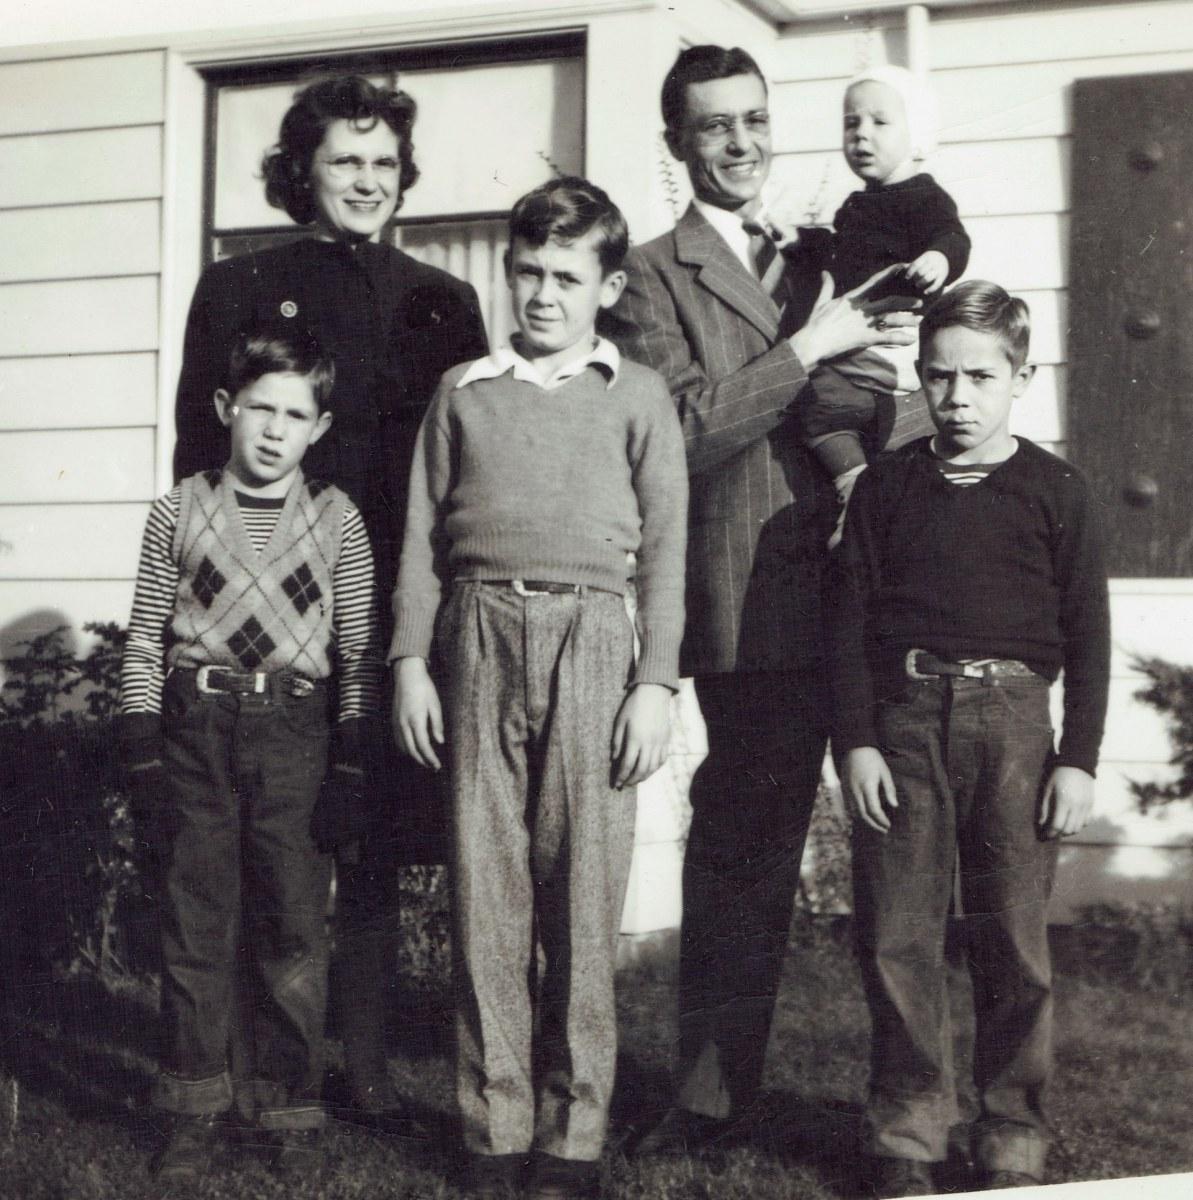 1947-November-27th Thanksgiving day